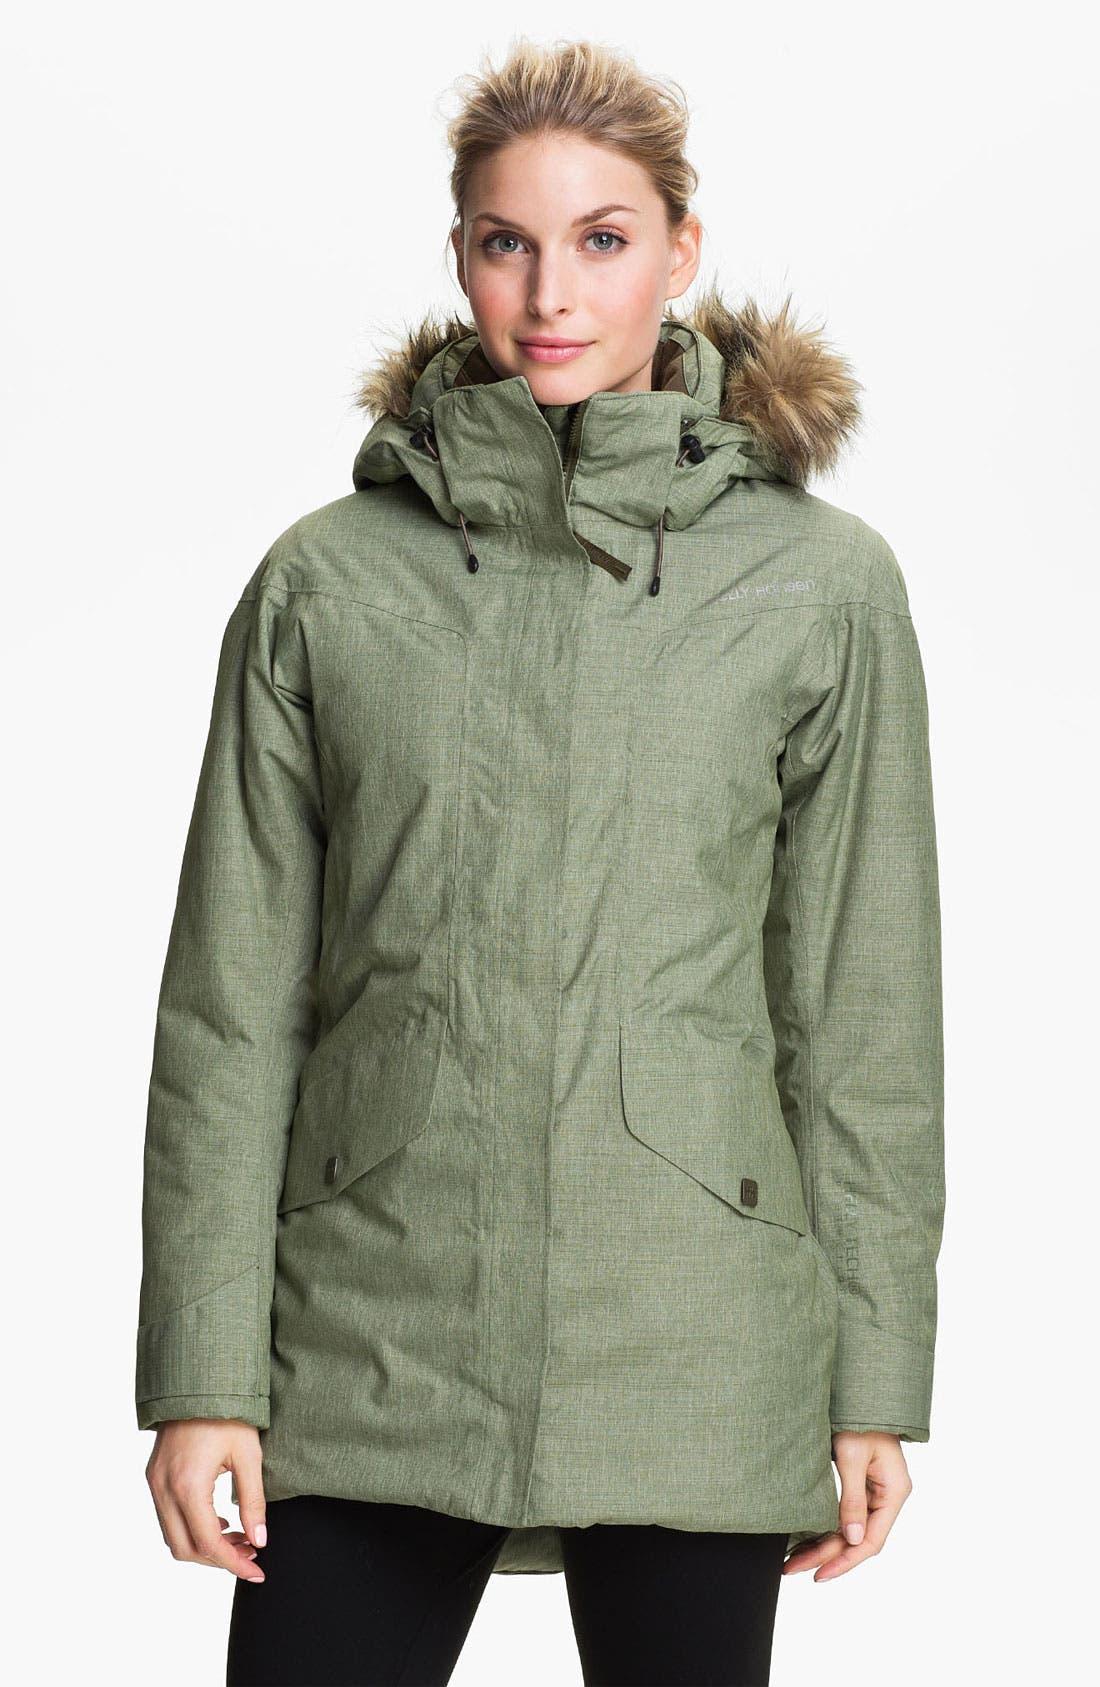 Main Image - Helly Hansen 'Hilton 2' Jacket